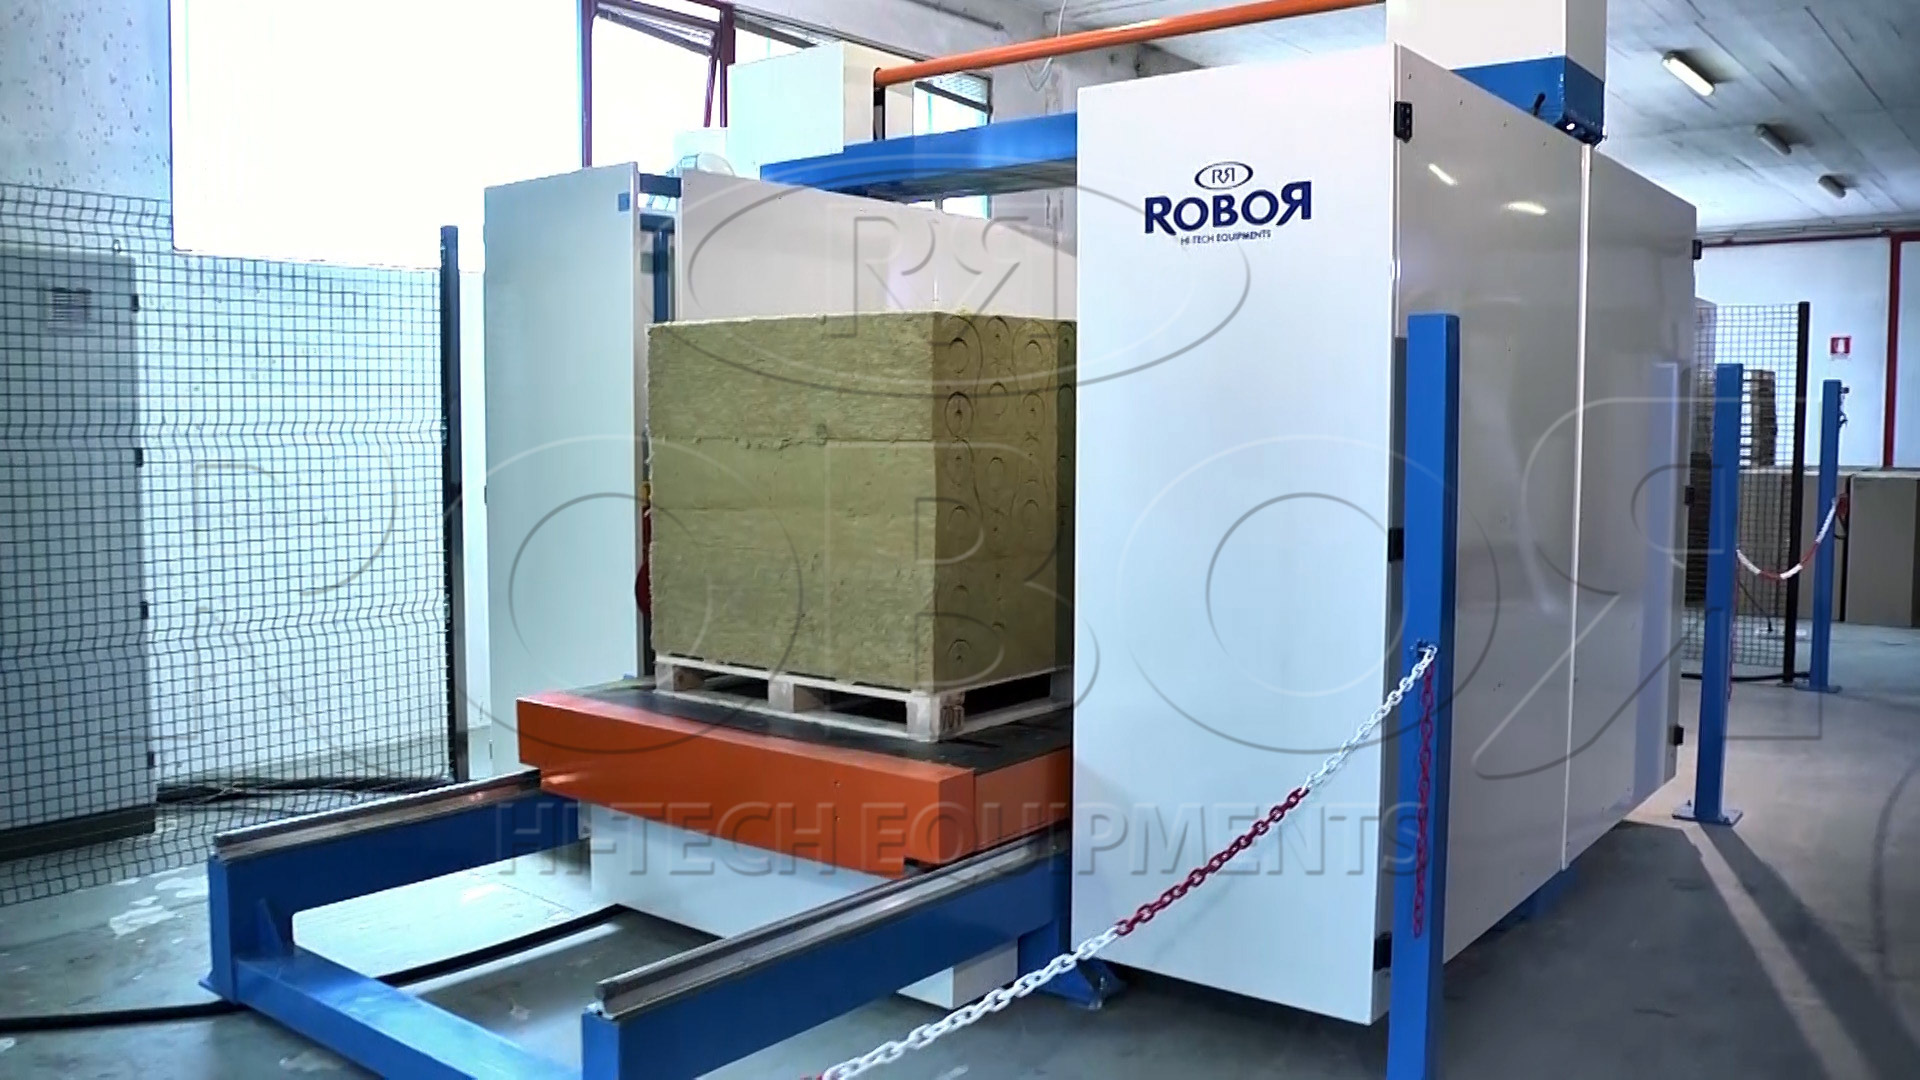 CNC cutting contouring machine - Insulation machines - ROBOR | Hi ...